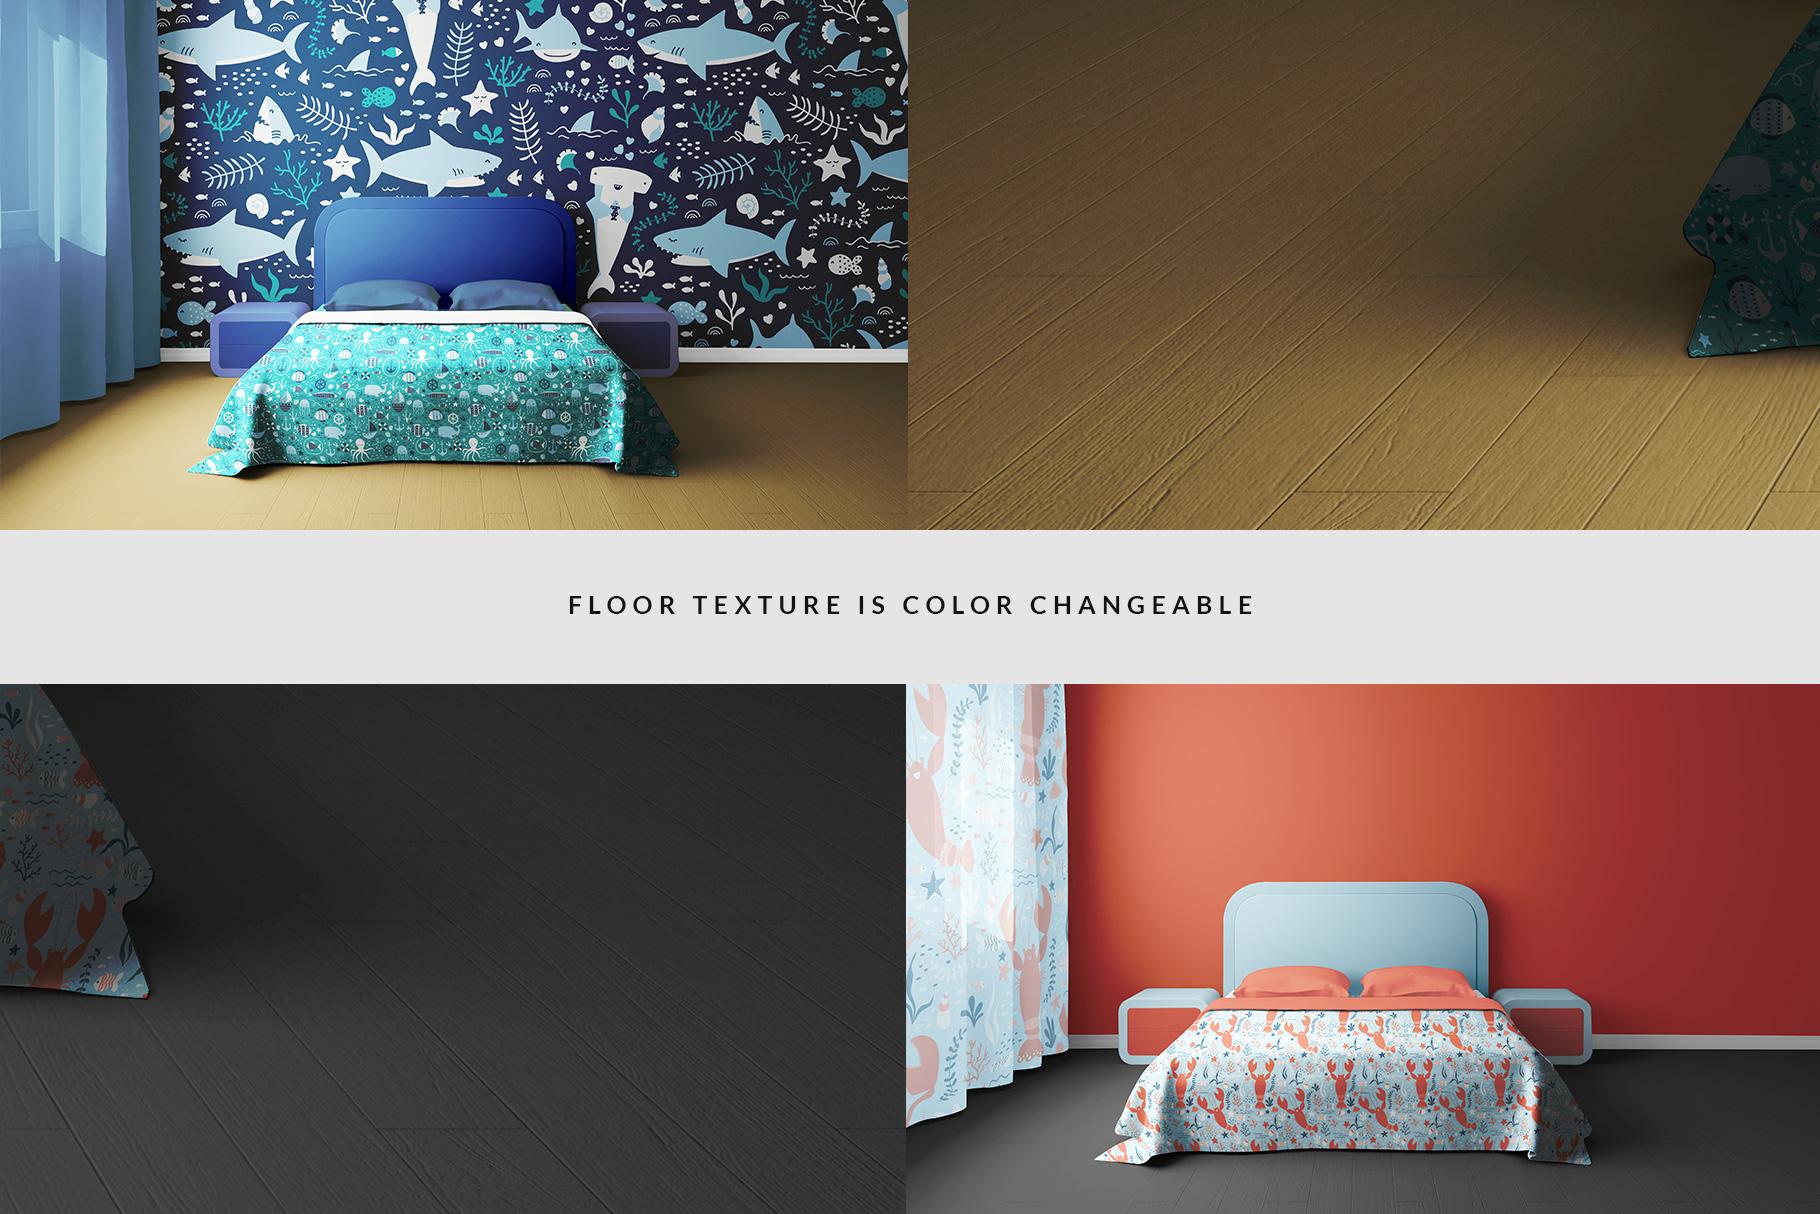 floor color change option of the bedroom interior mockup